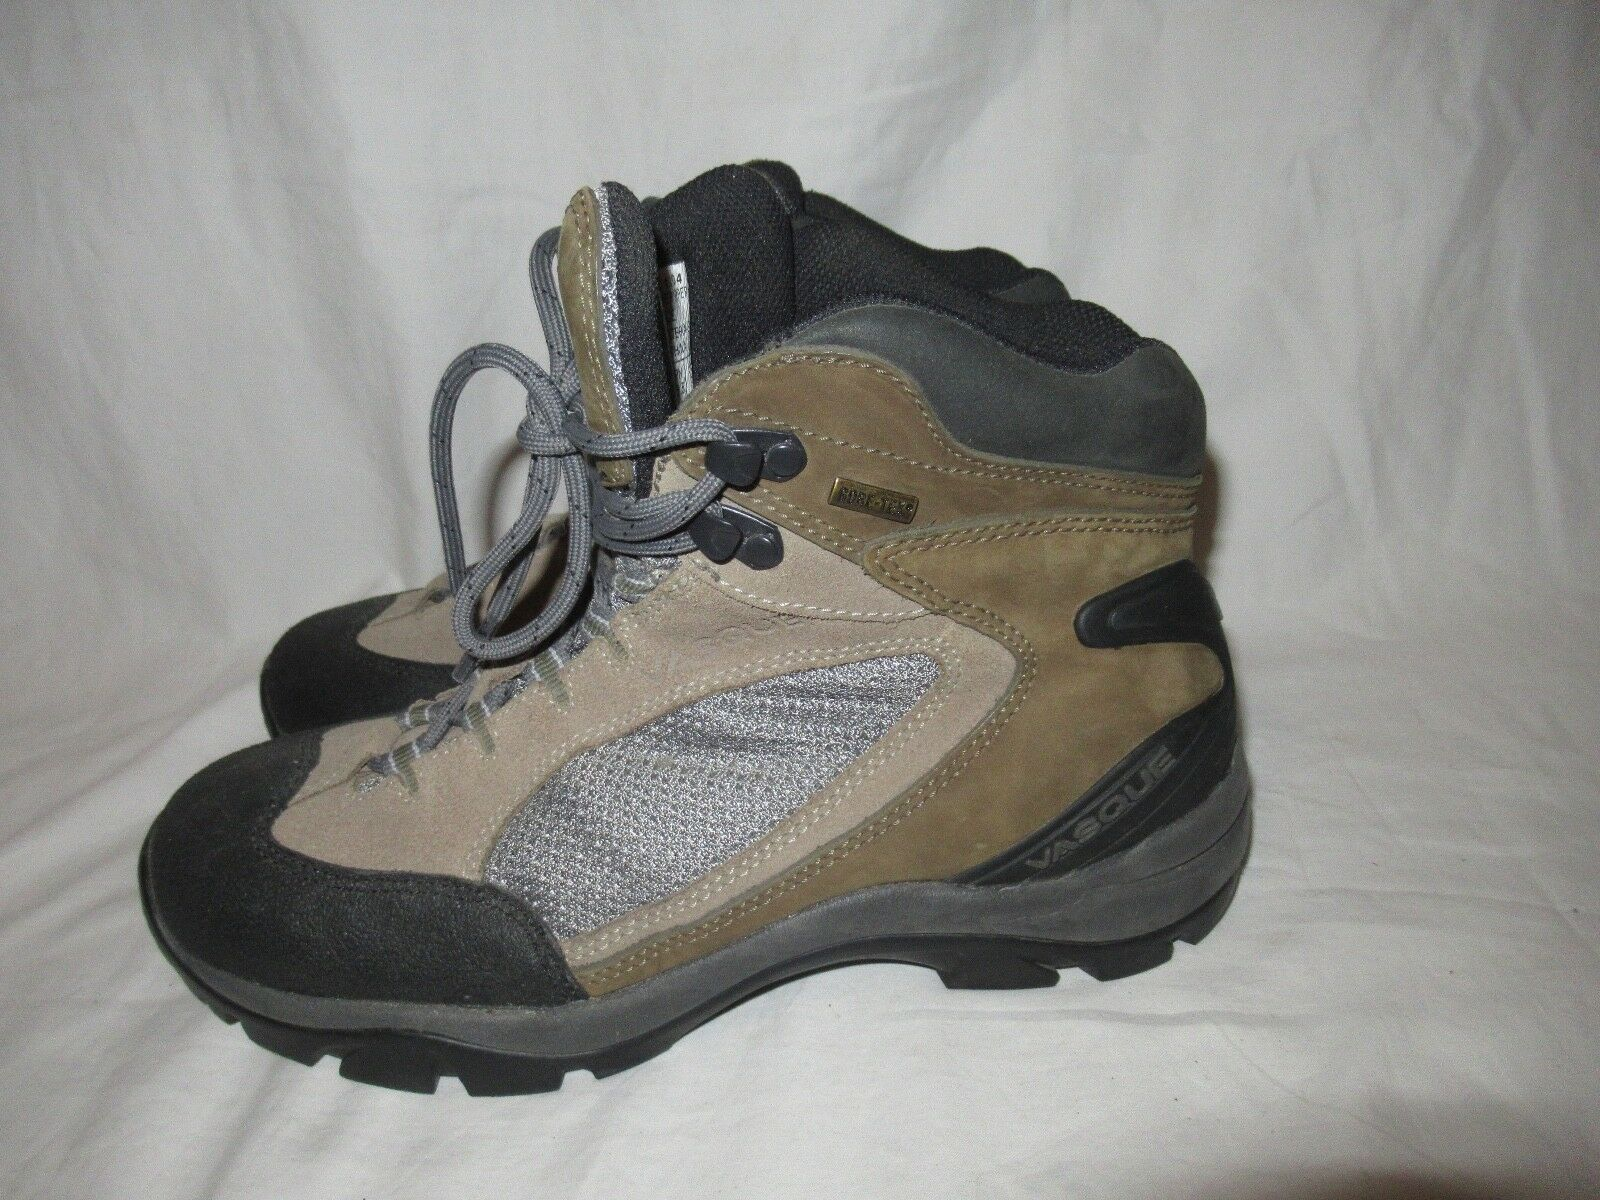 7433 Gore-Tex Hiking Trail Boots Women\'s size 9.5W Waterproof Vasque ...